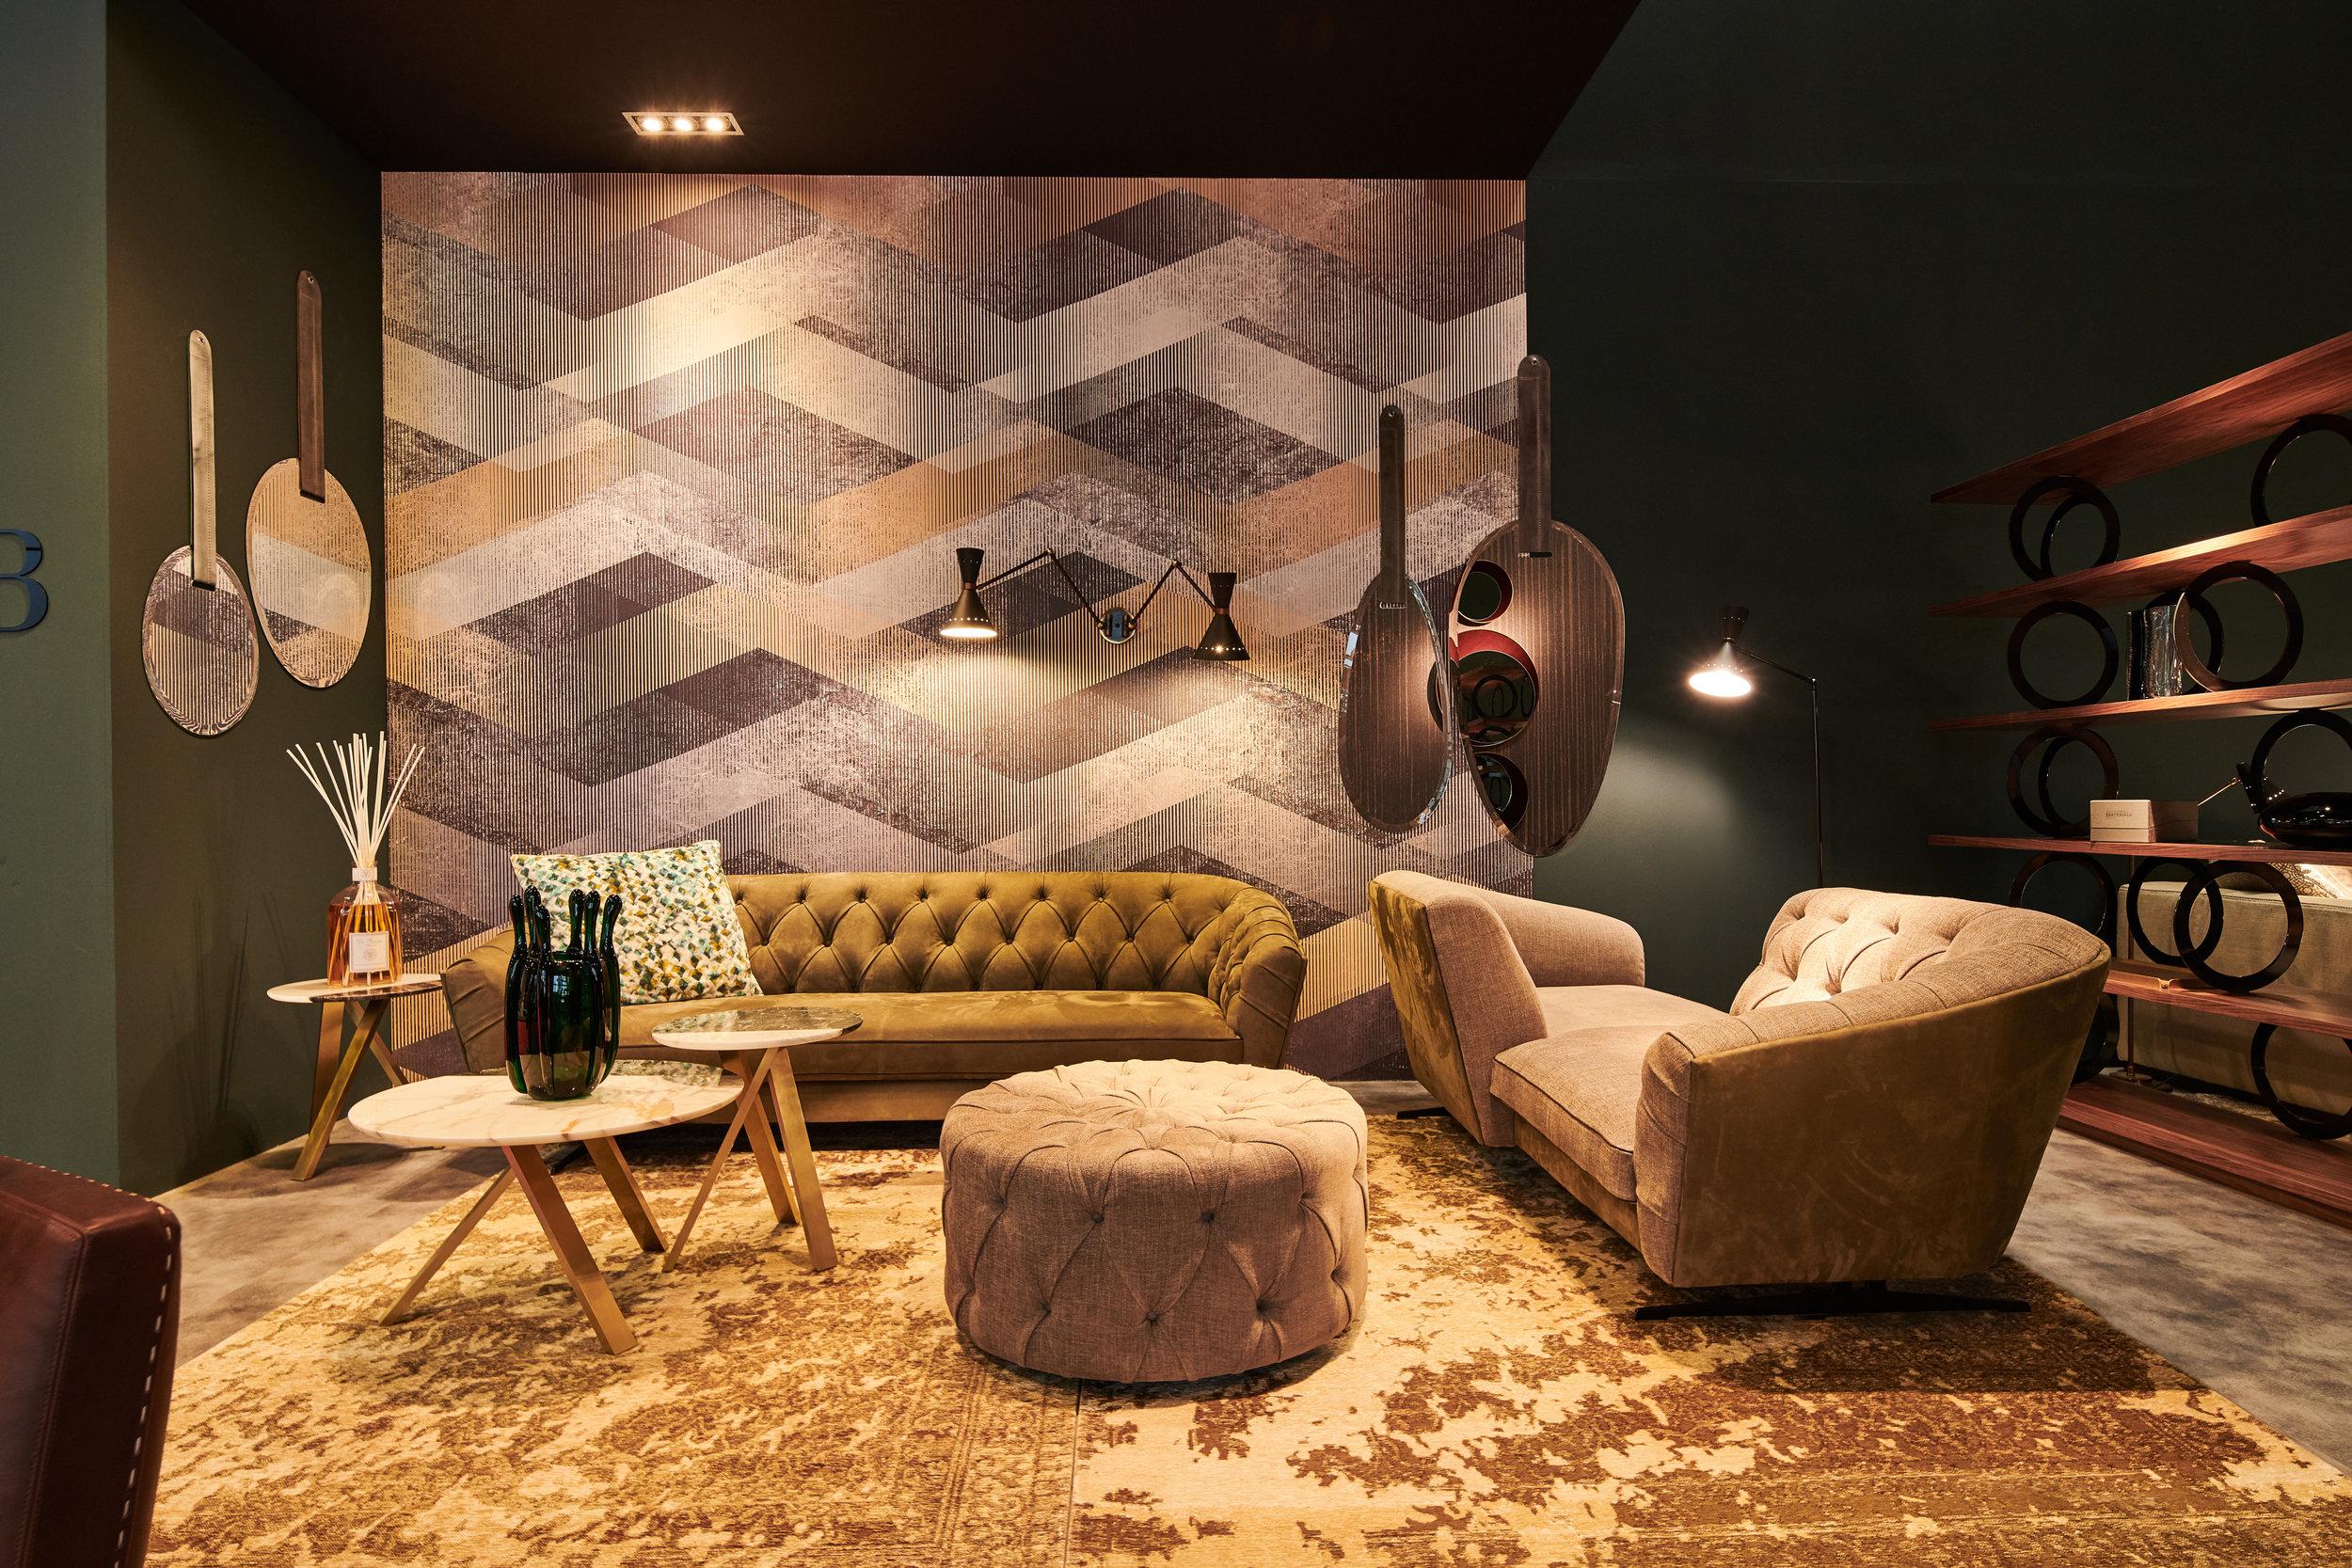 Let's talk about complimenting interior design by Borzalino via Masha Shapiro Agency UK.jpg